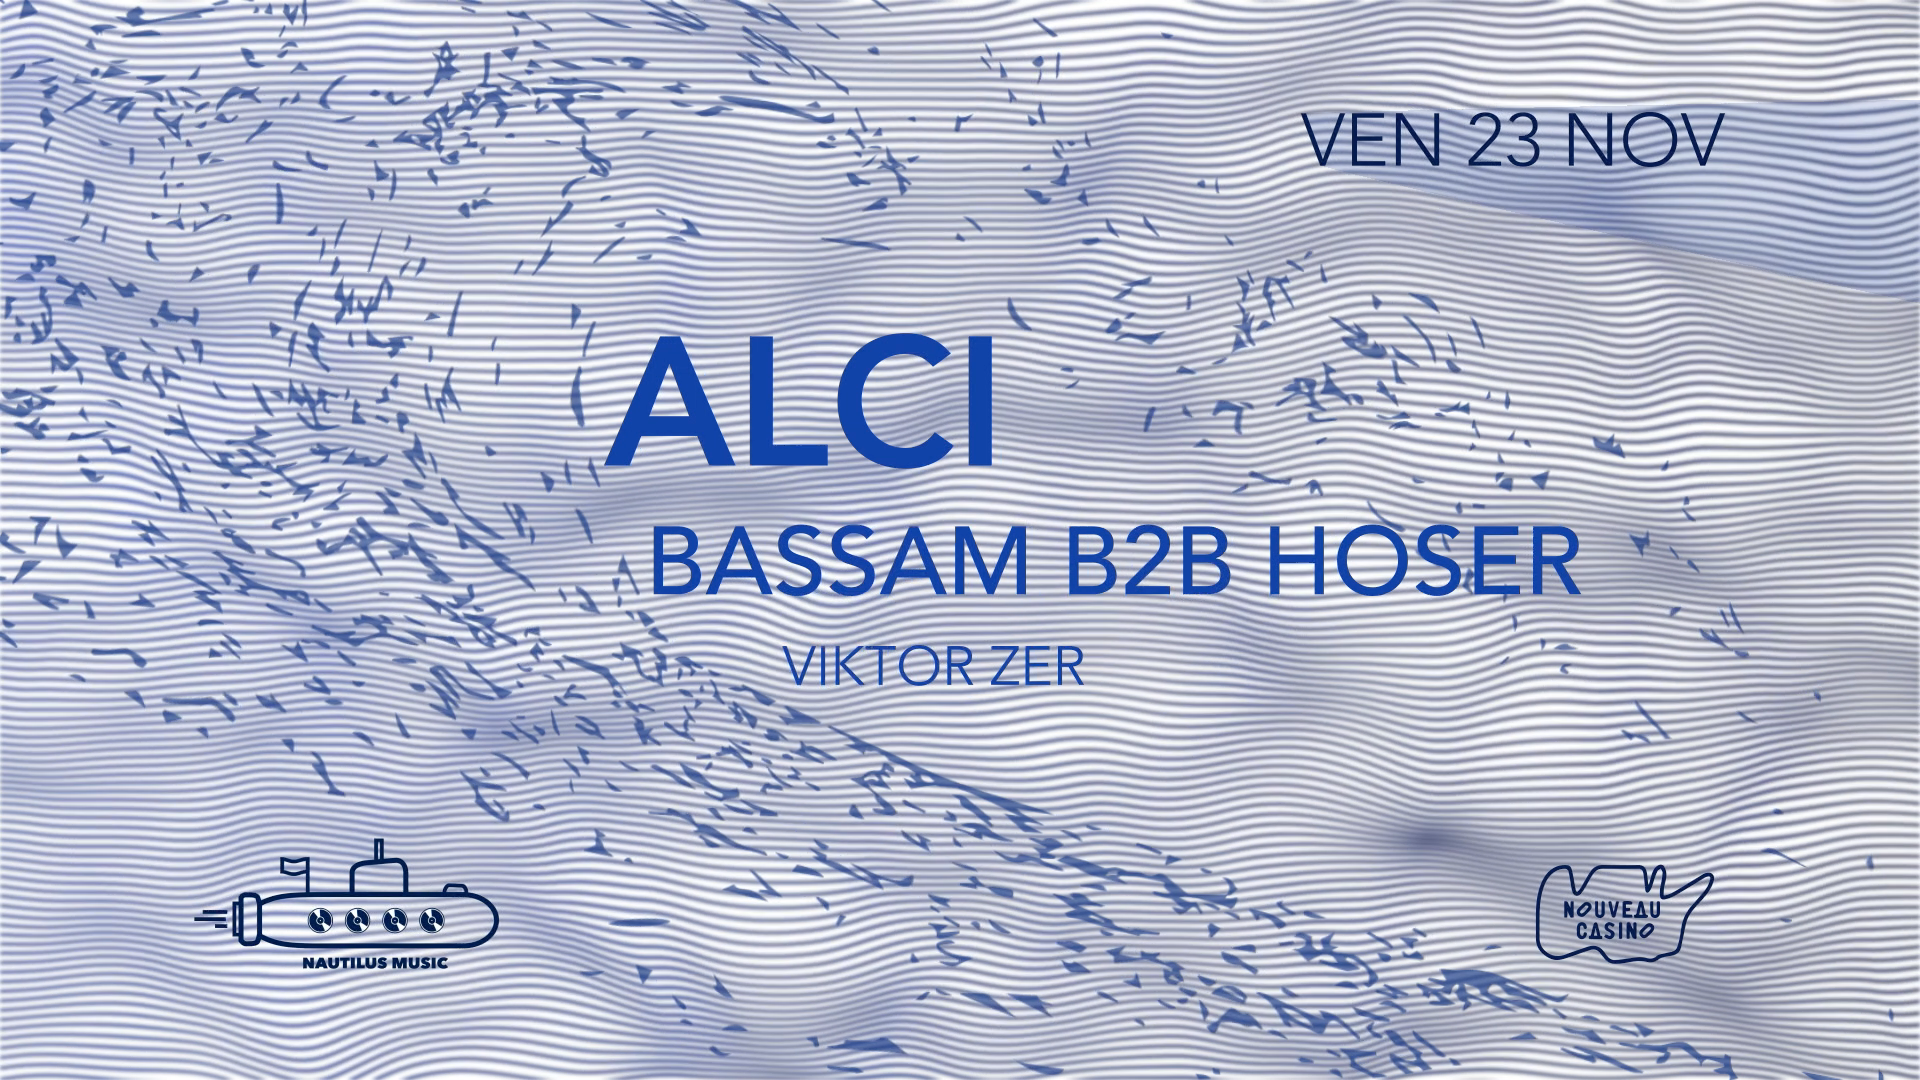 Nautilus invite : ALCI / Bassam B2B Hoser / Viktor Zer